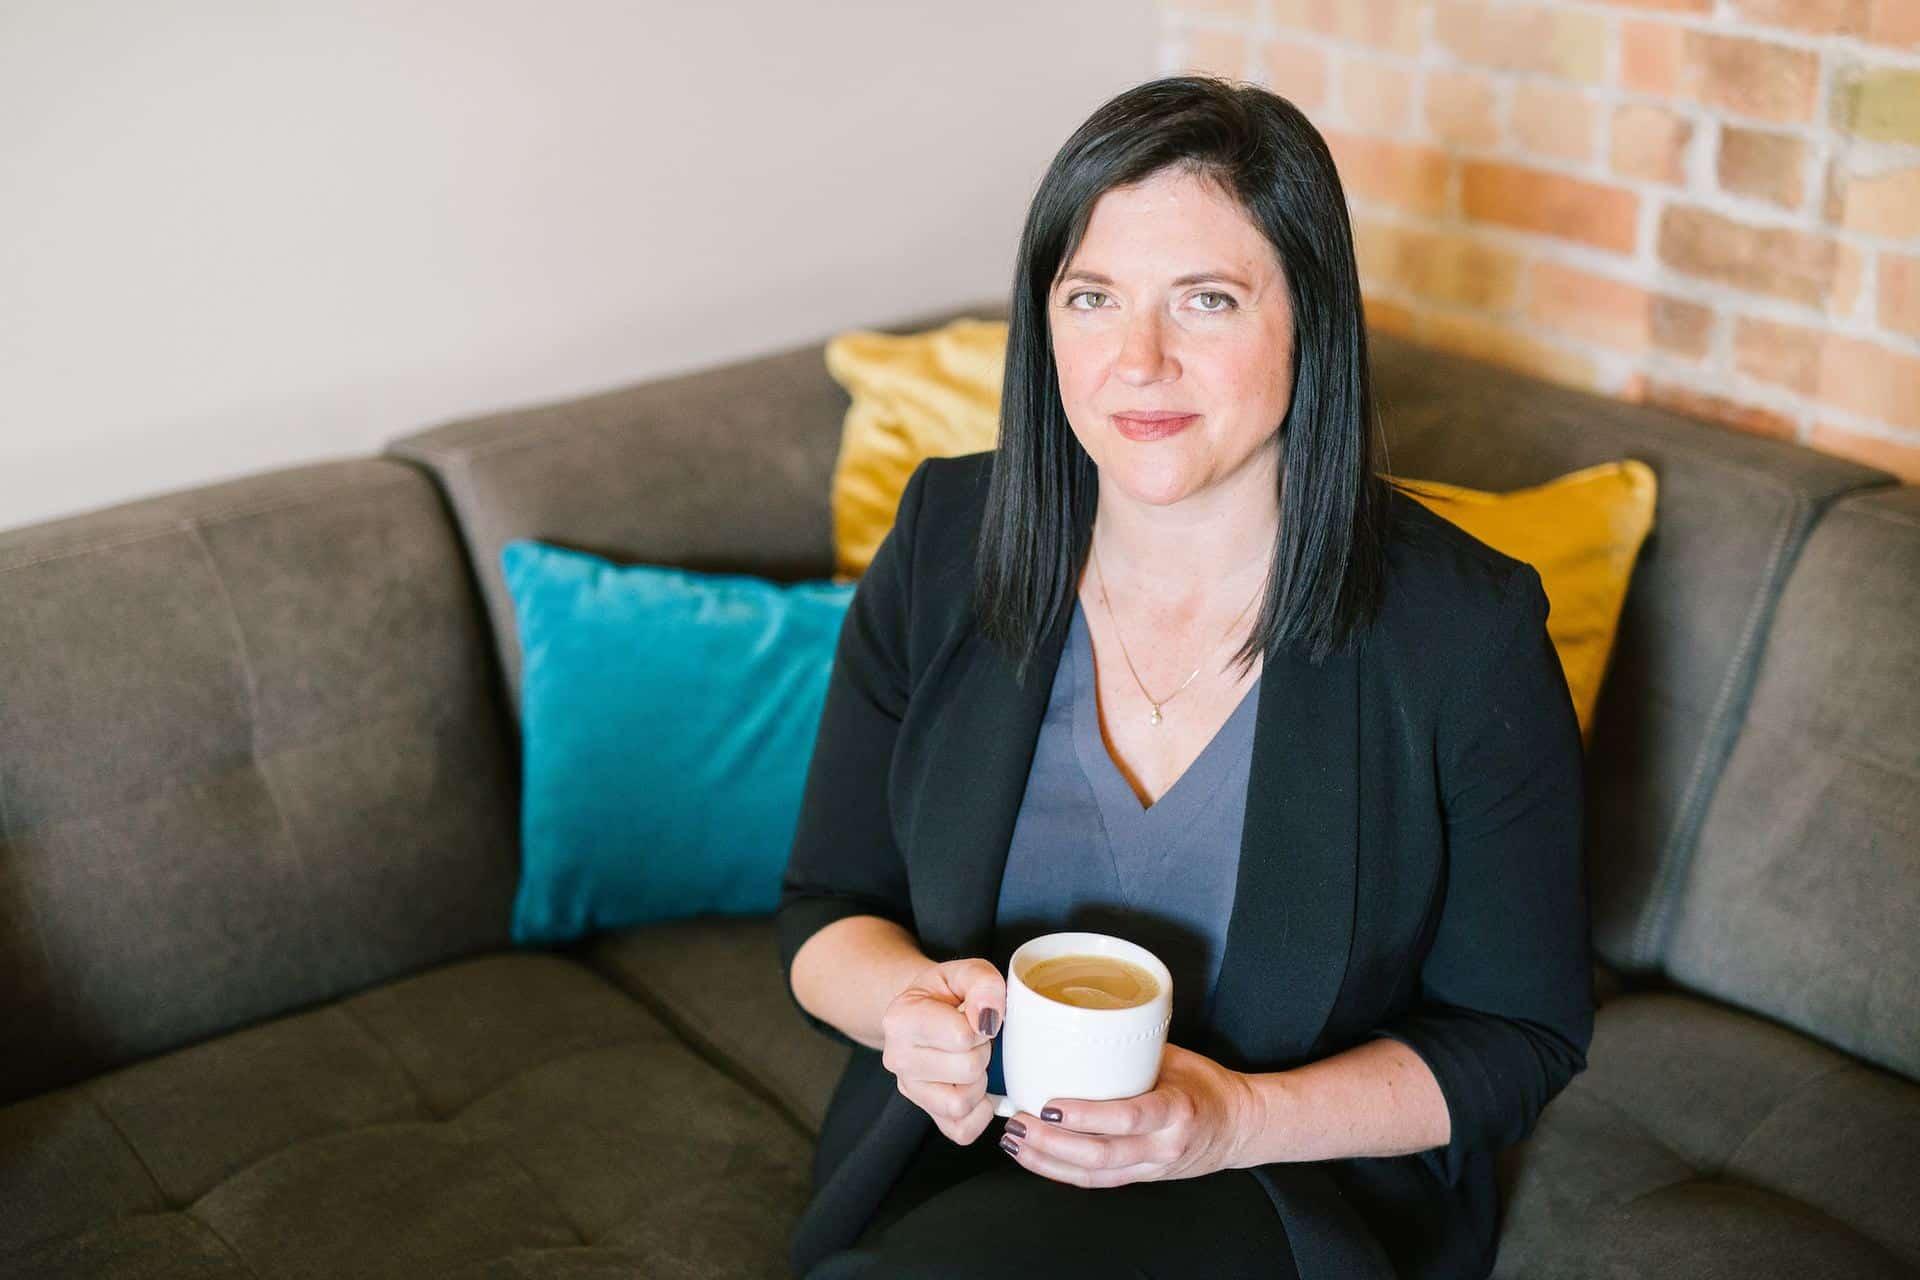 choosing a career counselor